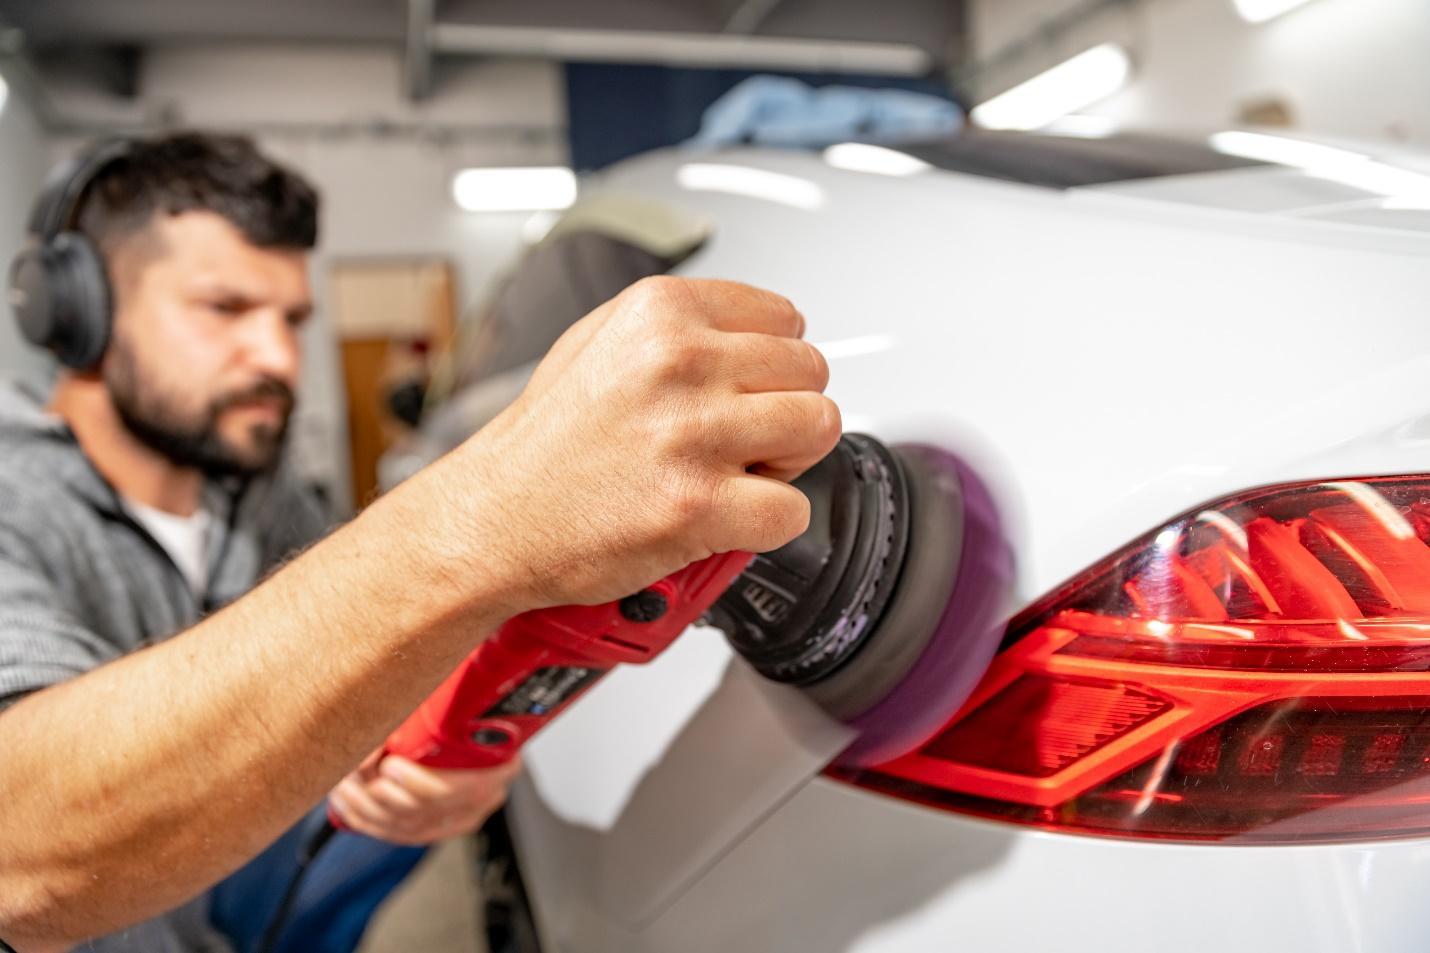 A professional ceramic coating a car instead of DIY ceramic coating.